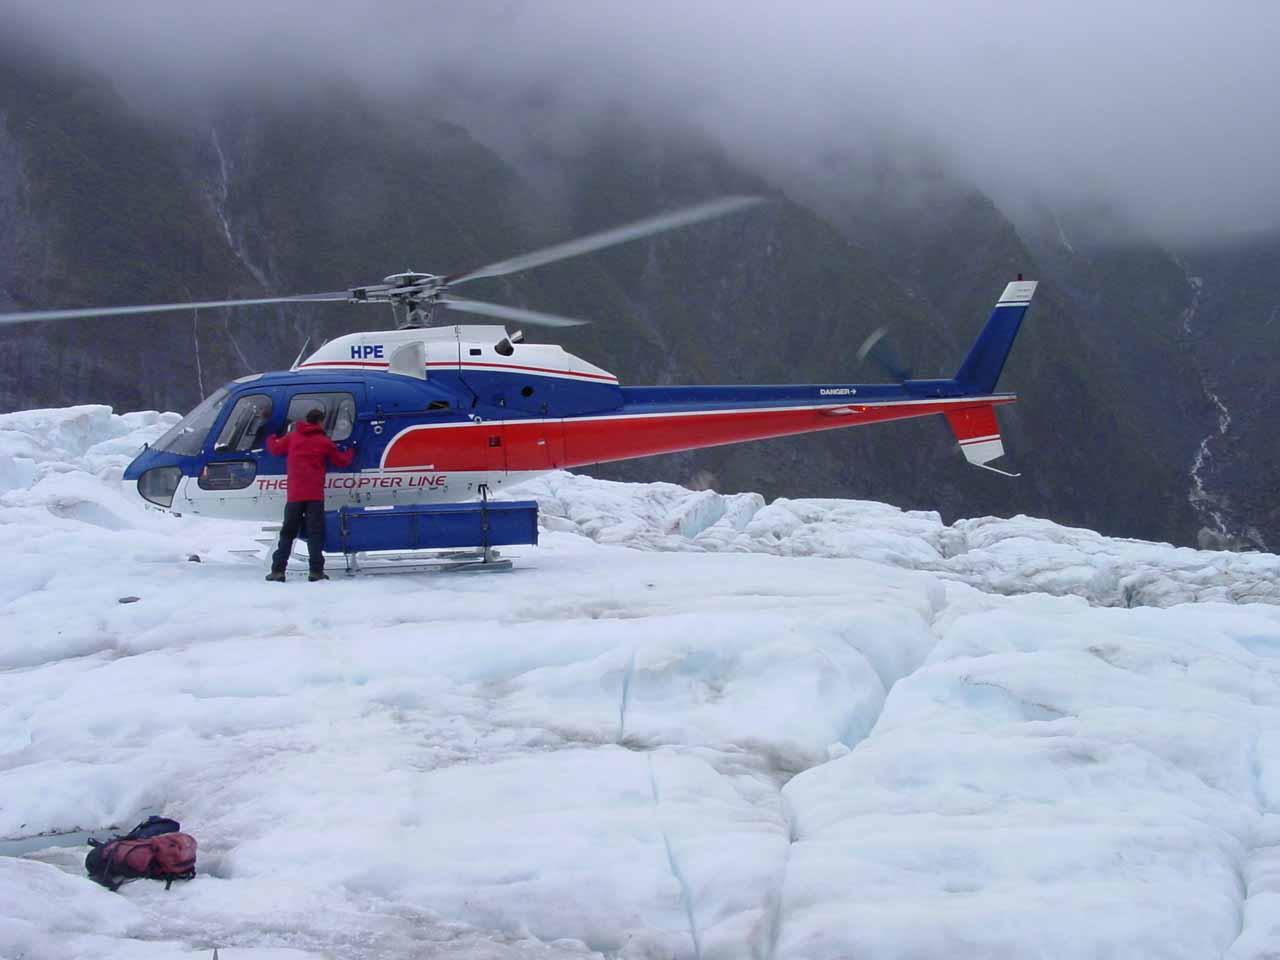 The chopper landing on the glacier